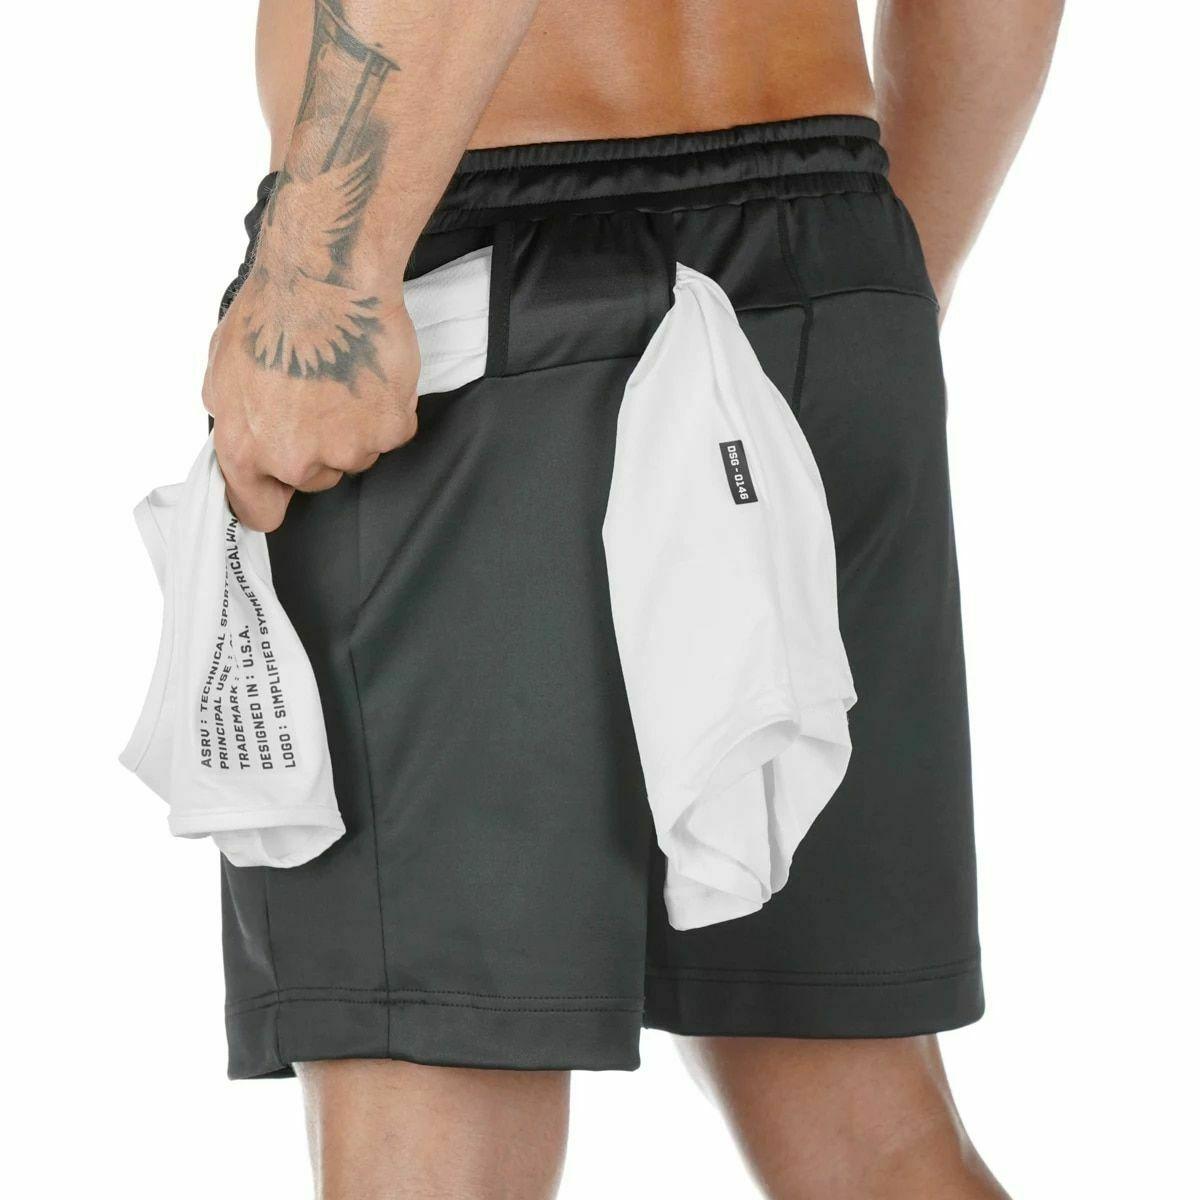 product-Ruiteng-Men Fashion Workout Sportswear Shorts-img